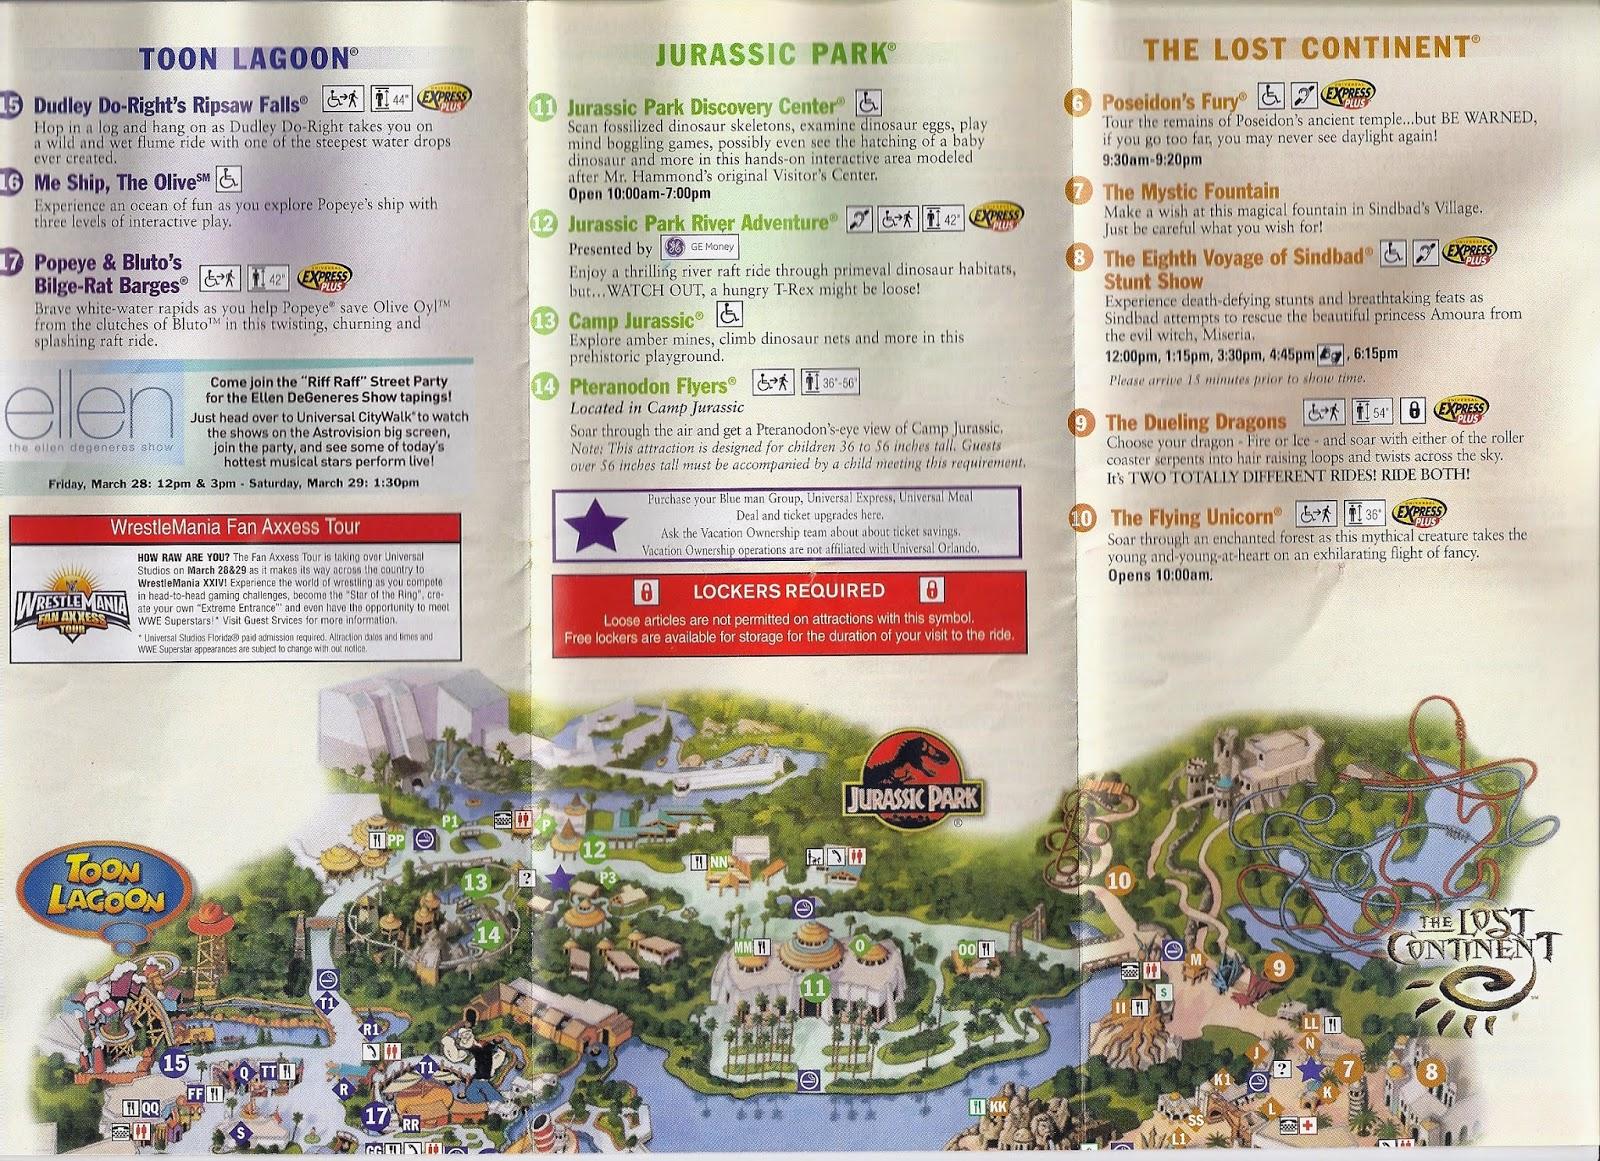 All Around Orlando Retro 2007 Islands of Adventure Theme Park